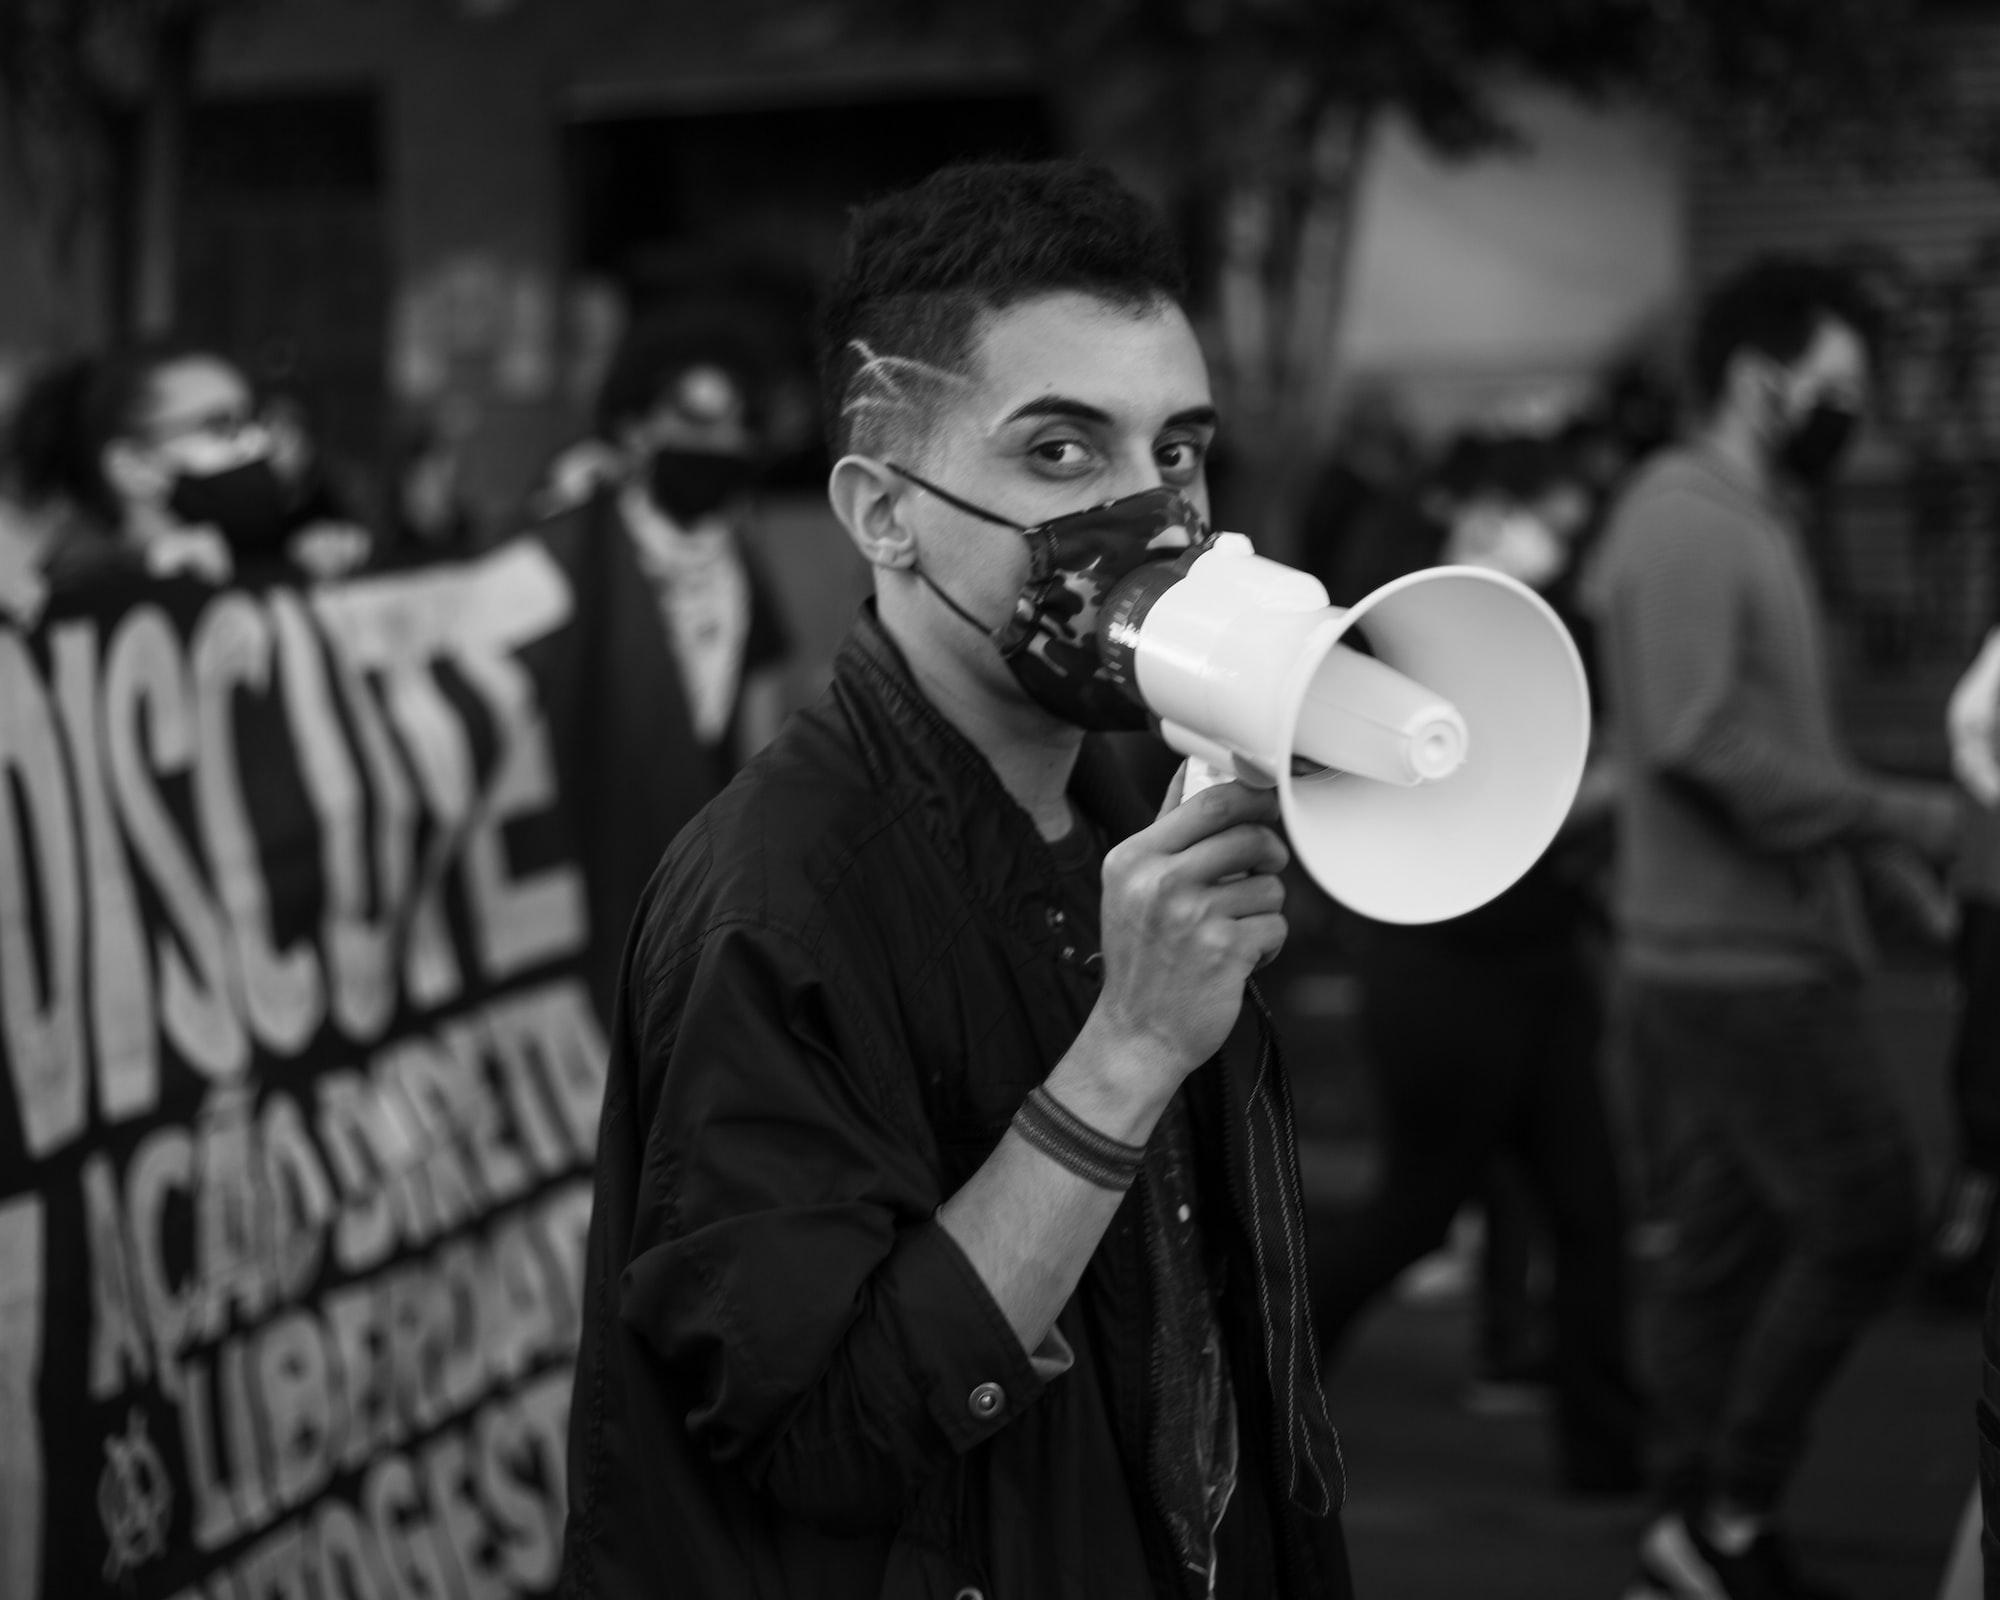 protester holding megaphone